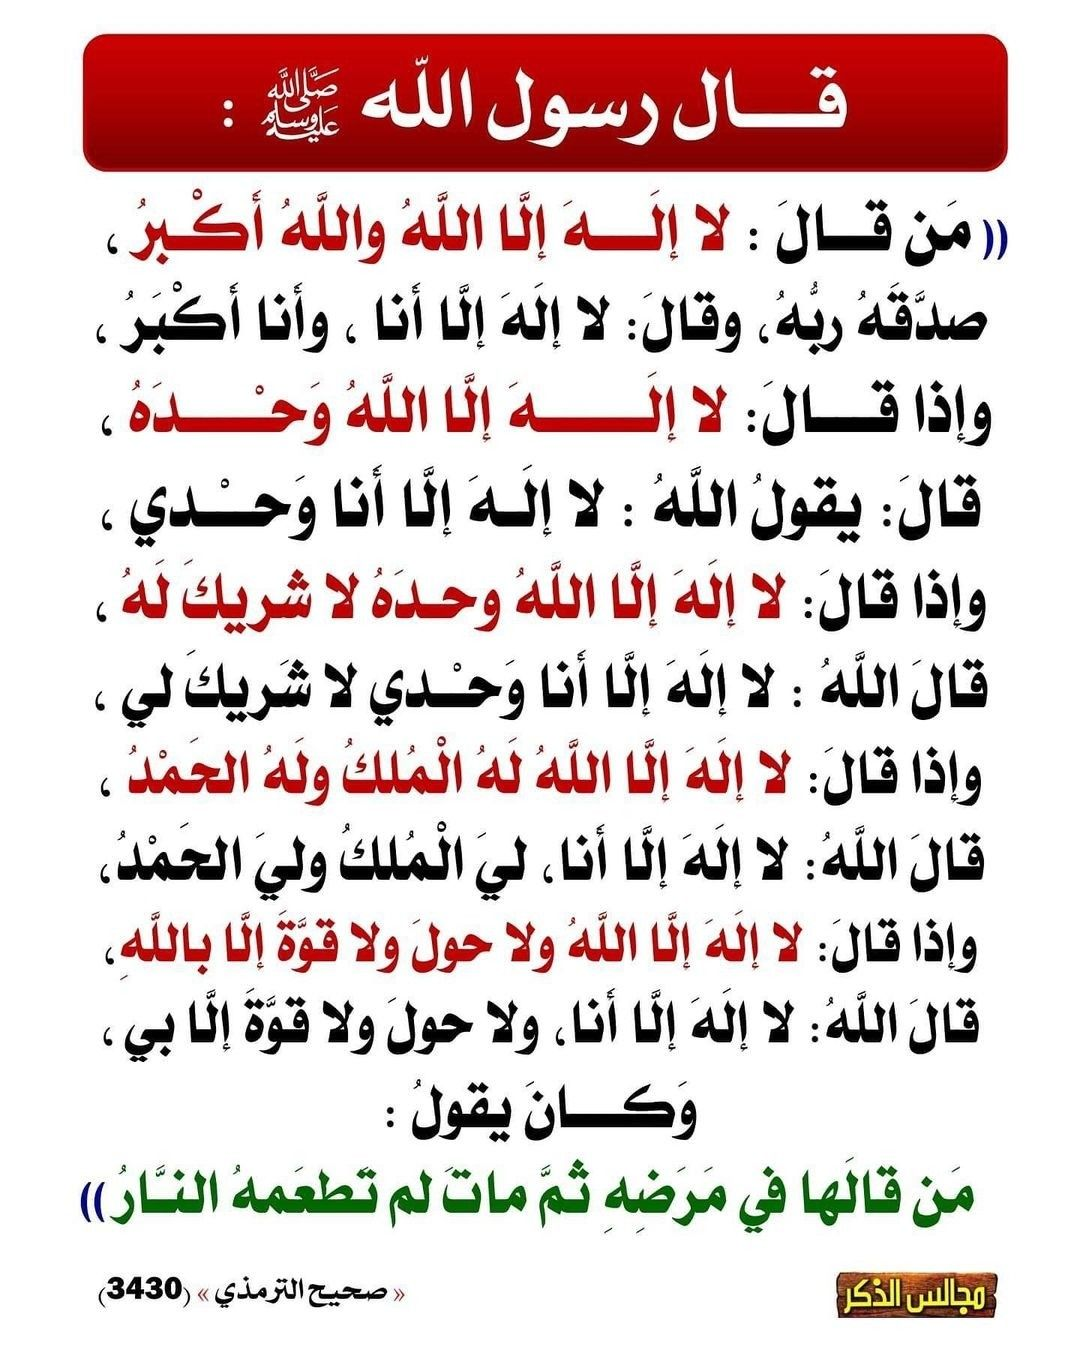 Pin By عبق الورد On أحاديث نبوية ١ In 2021 Ahadith Math Hadith